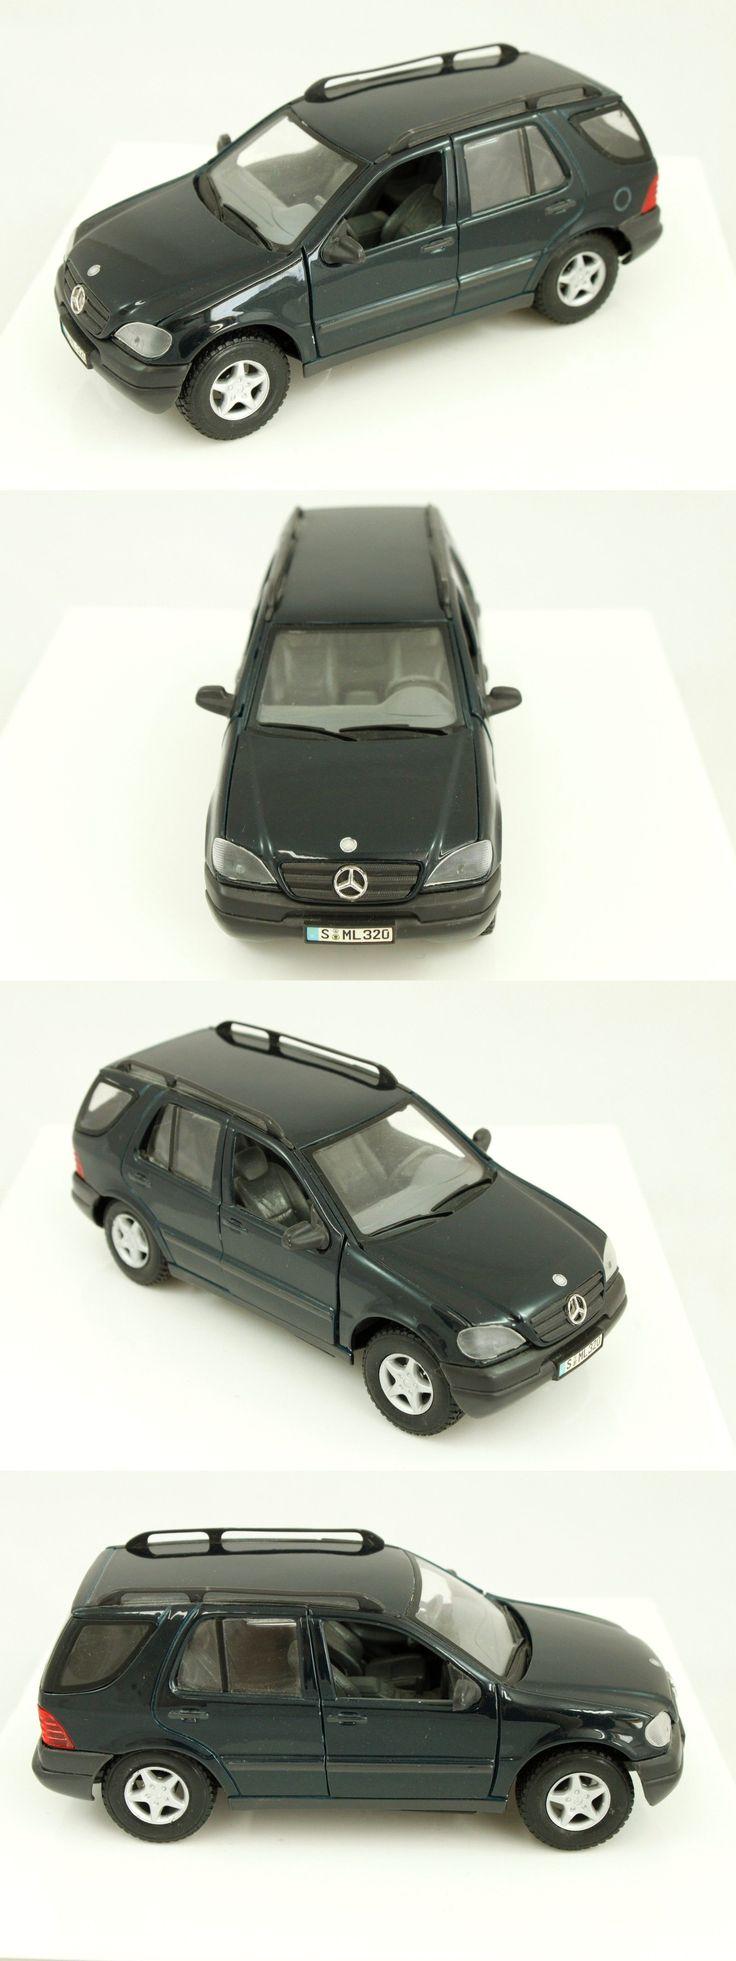 Suvs maisto mercedes benz ml320 black model car suv 1 24 diecast buy it now only 11 95 suvs pinterest models mercedes benz and black models